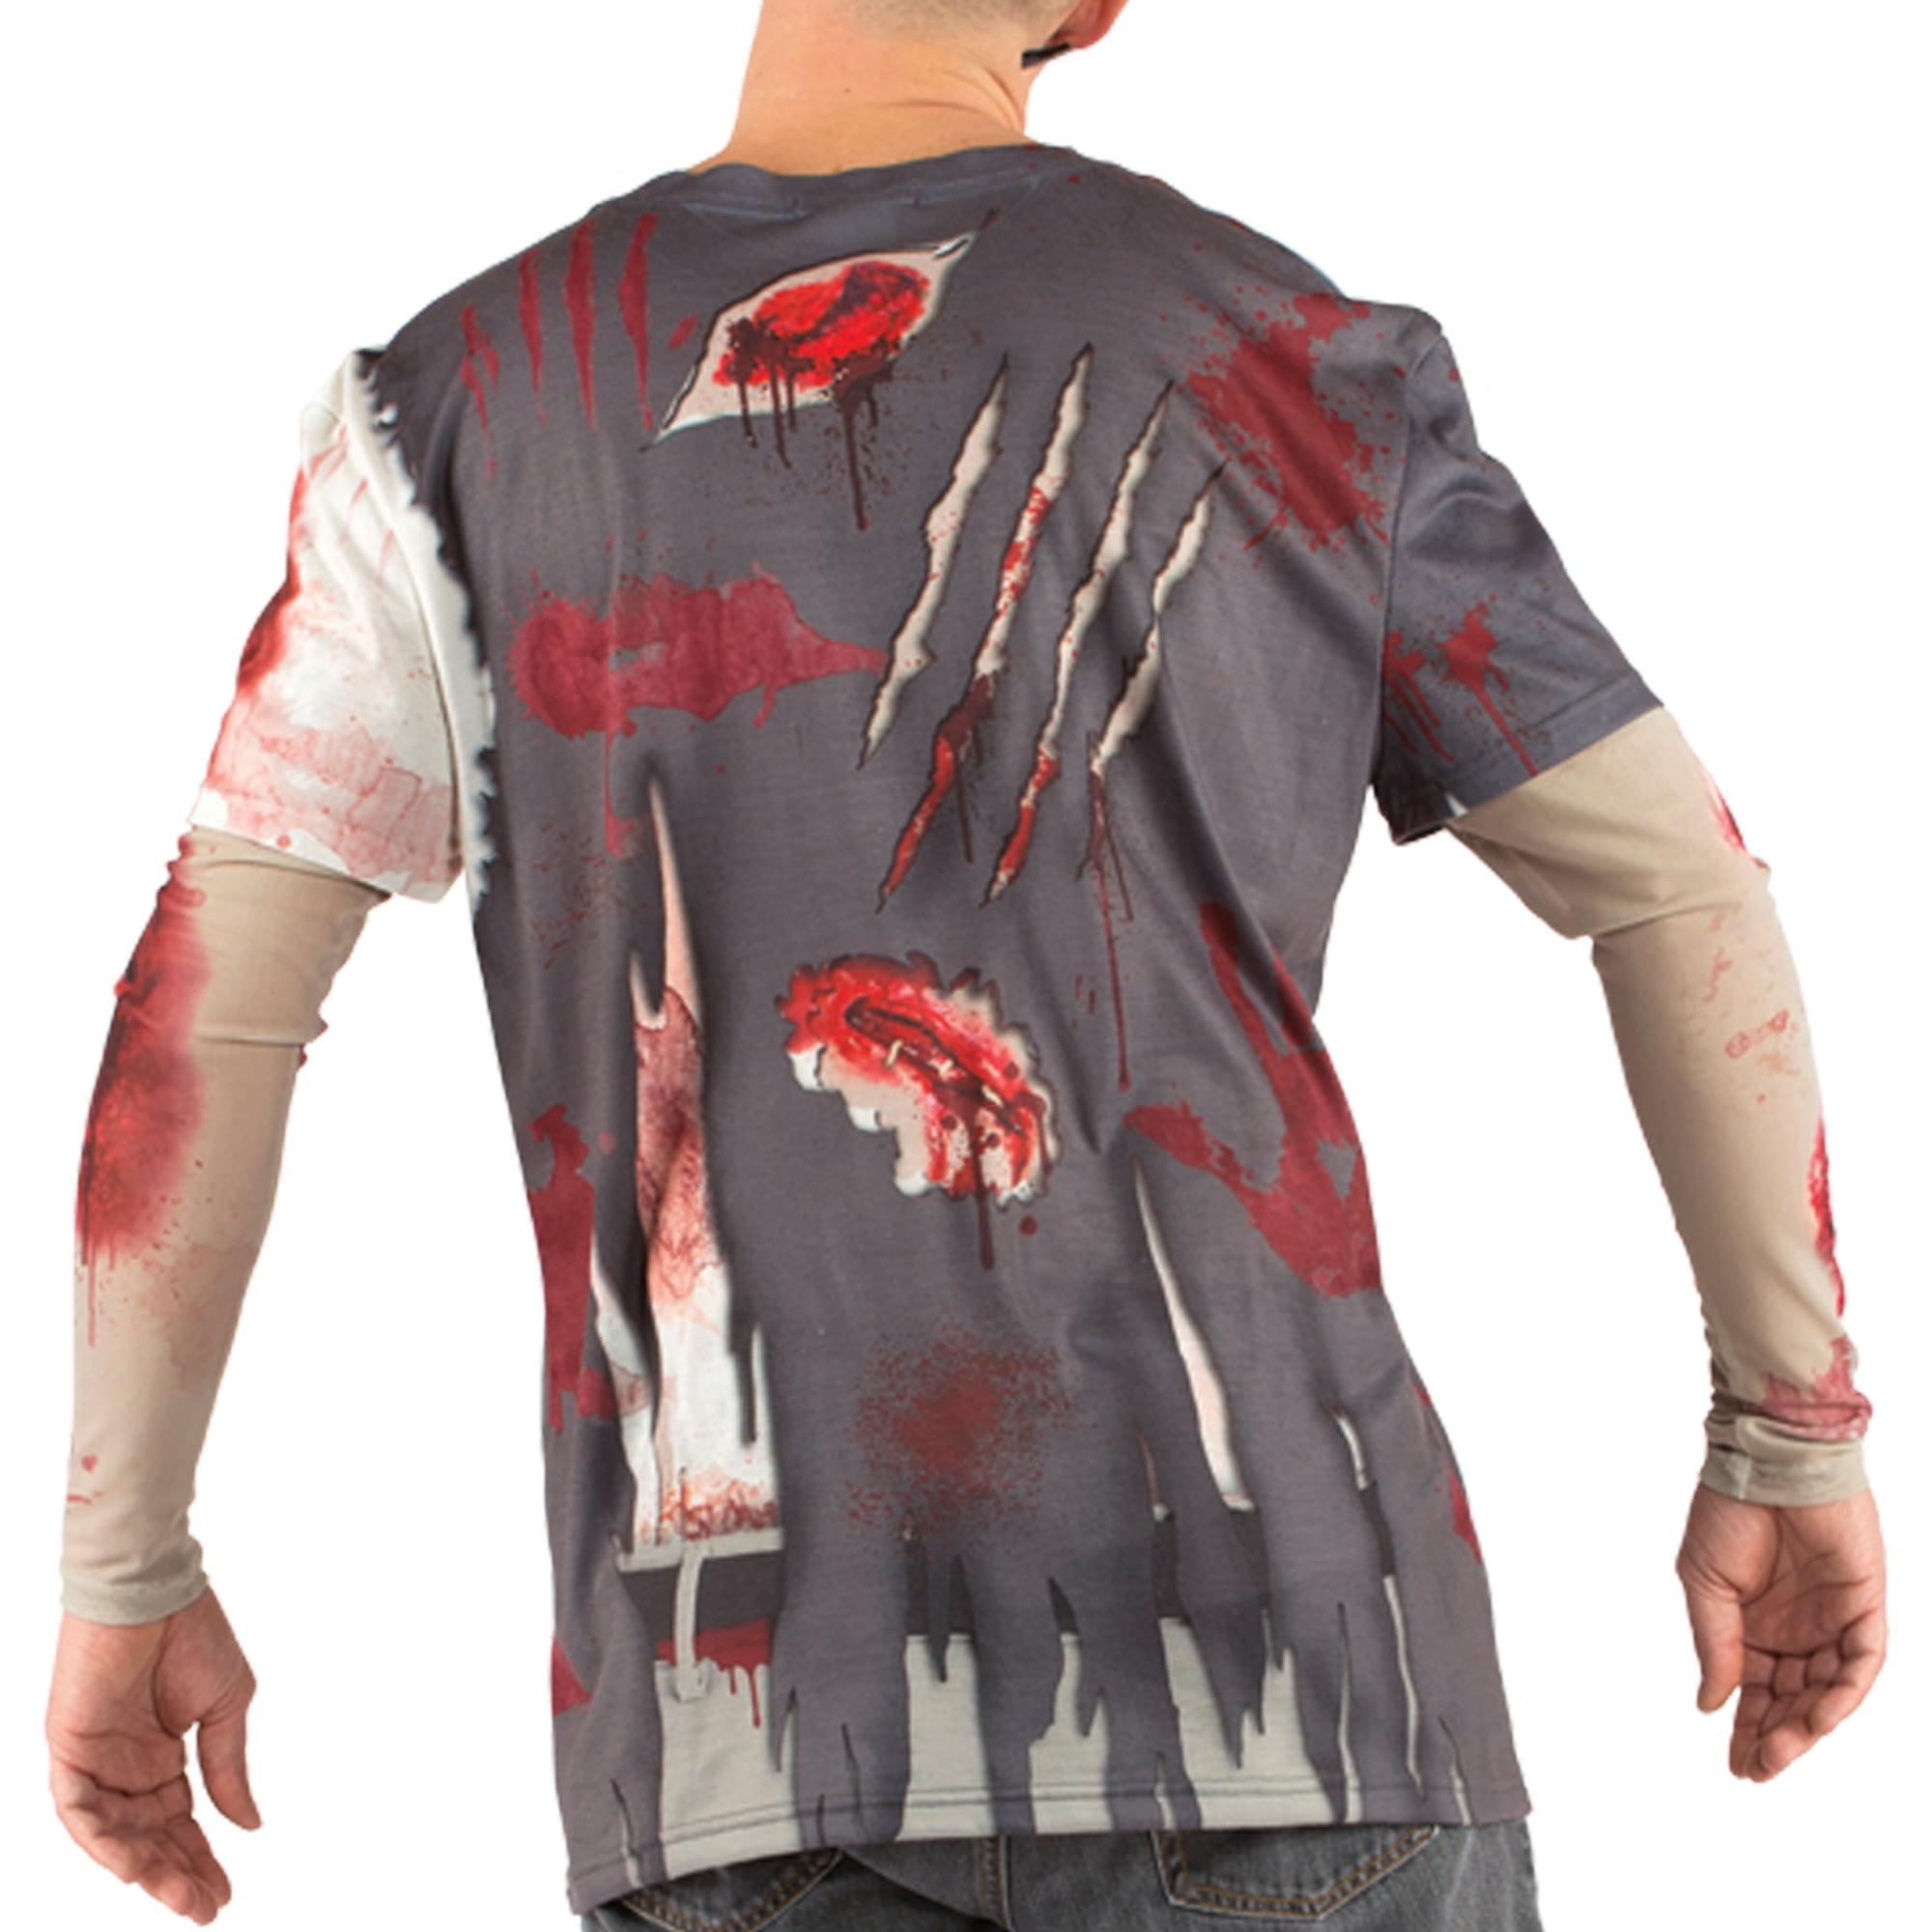 Big Men's Zombie Tee Shirt with Mesh Long Sleeves, 2XL